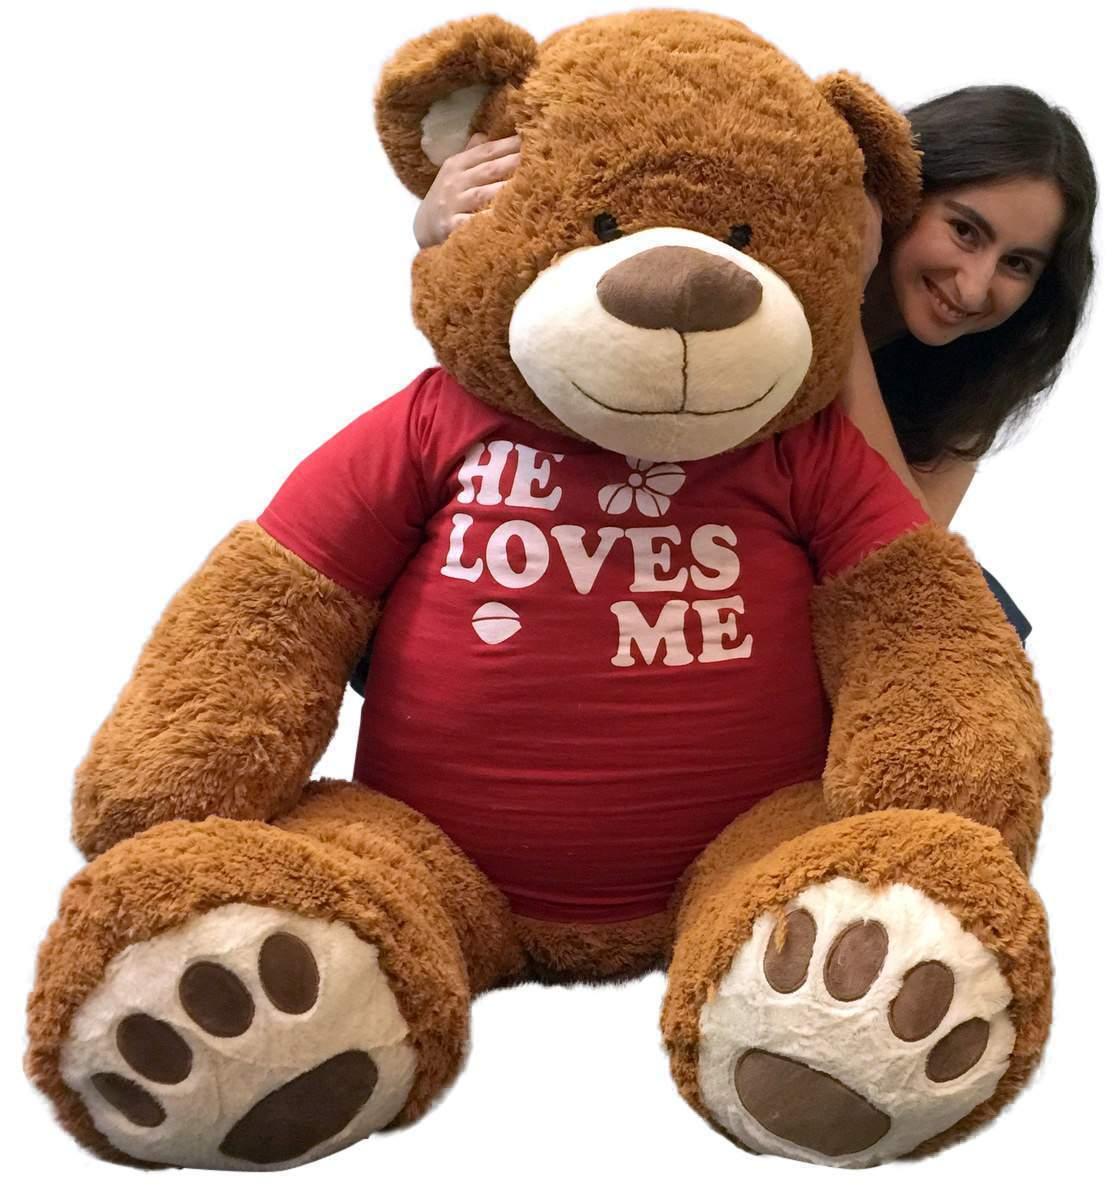 5 Ft Giant Teddy Bear 60 Inch Soft Cinnamon marrone Color Wears HE LOVES ME Tshirt